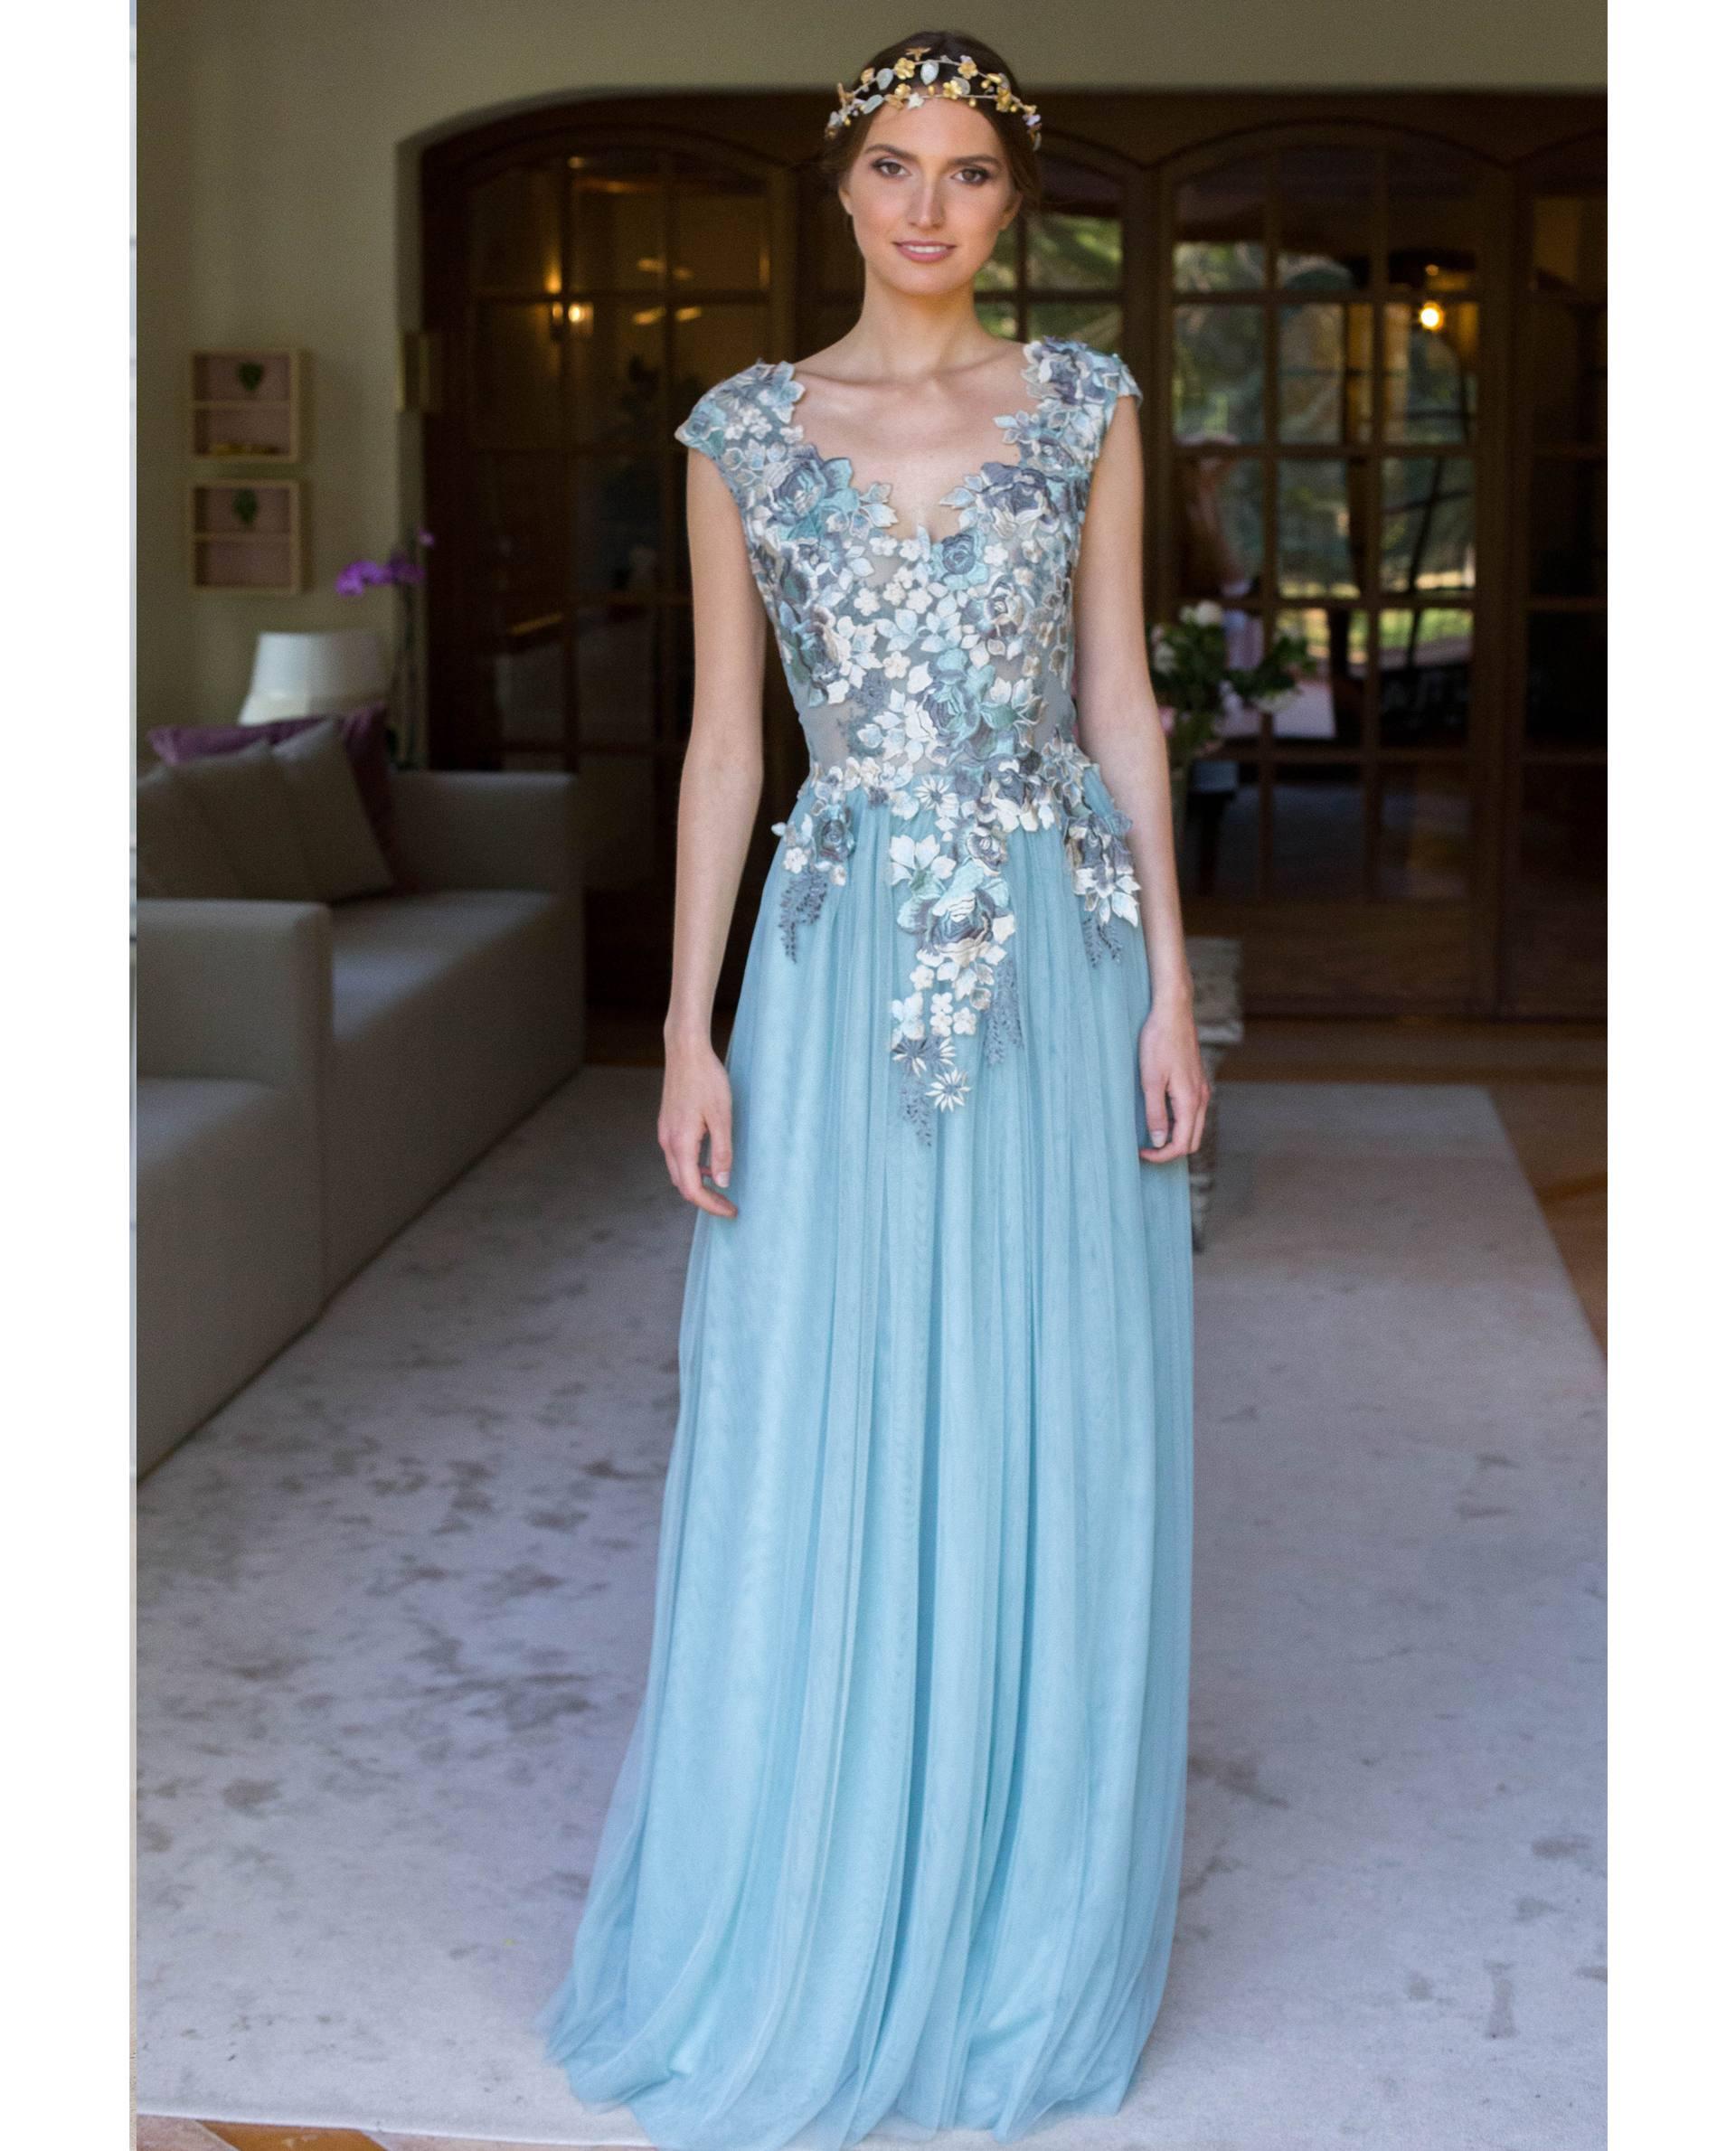 ATELIER-NATURE 2017/18 - VESTIDOS - vestido fiesta JOSÉPHINE azul